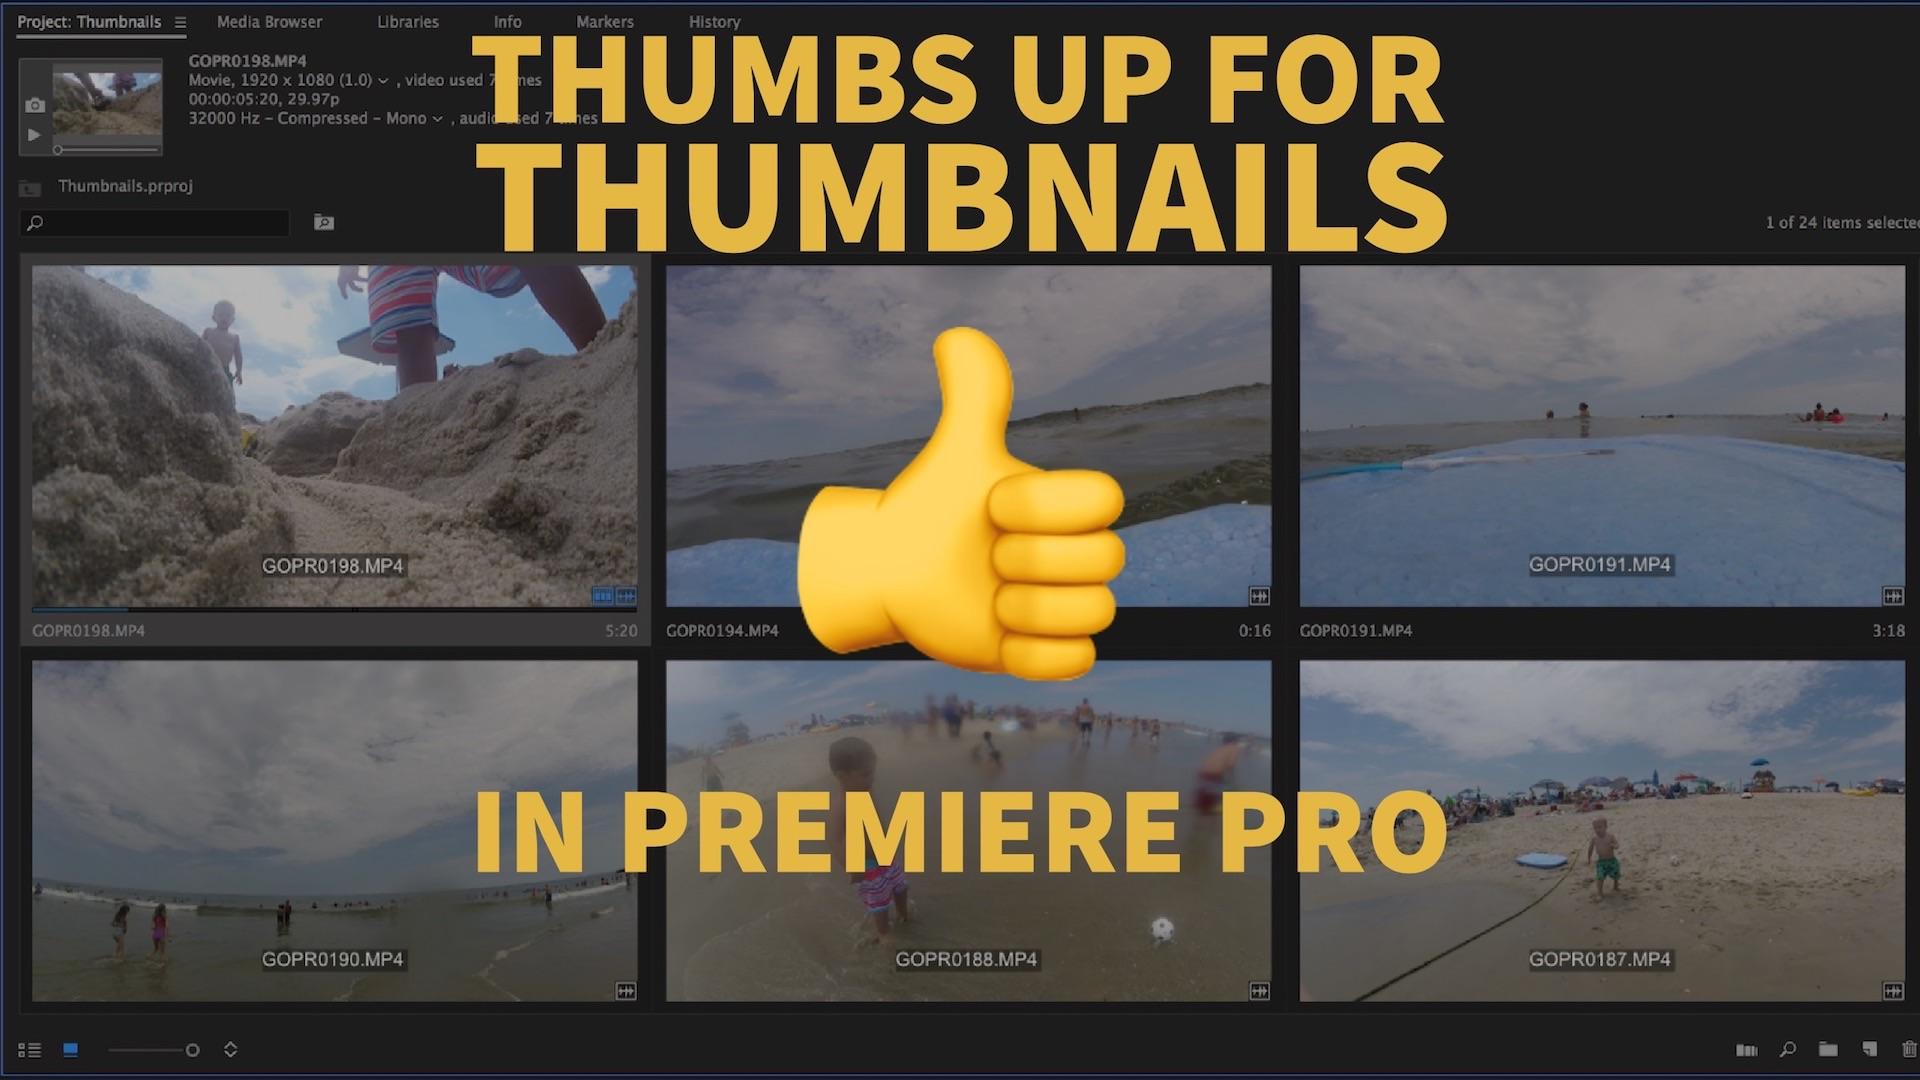 thumbs-up-thumbnails-premiere-pro